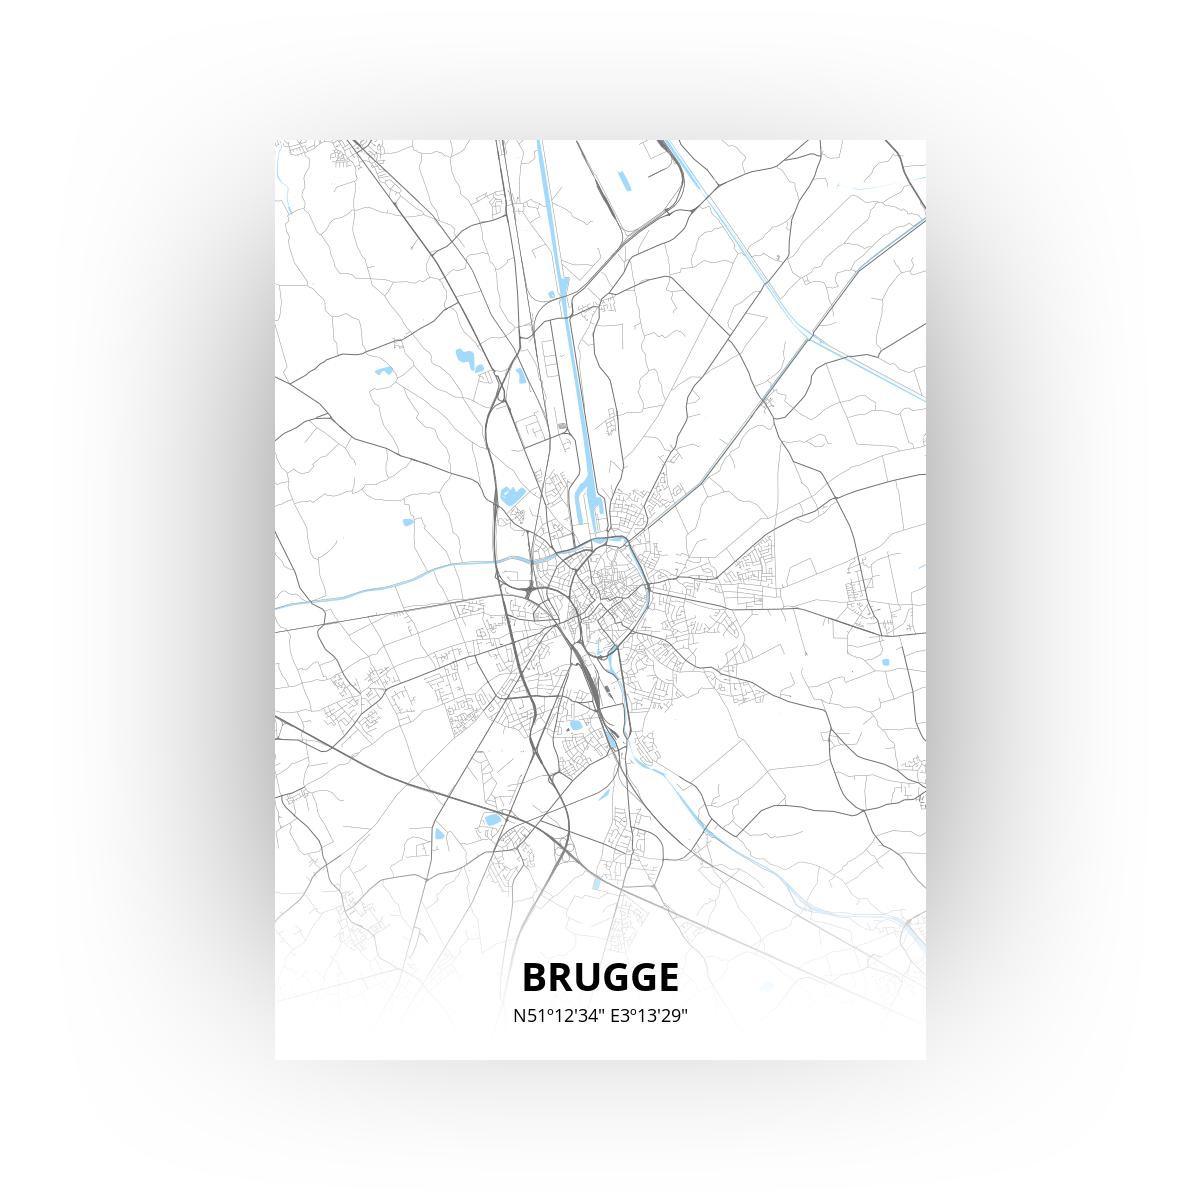 Brugge print - Standaard stijl